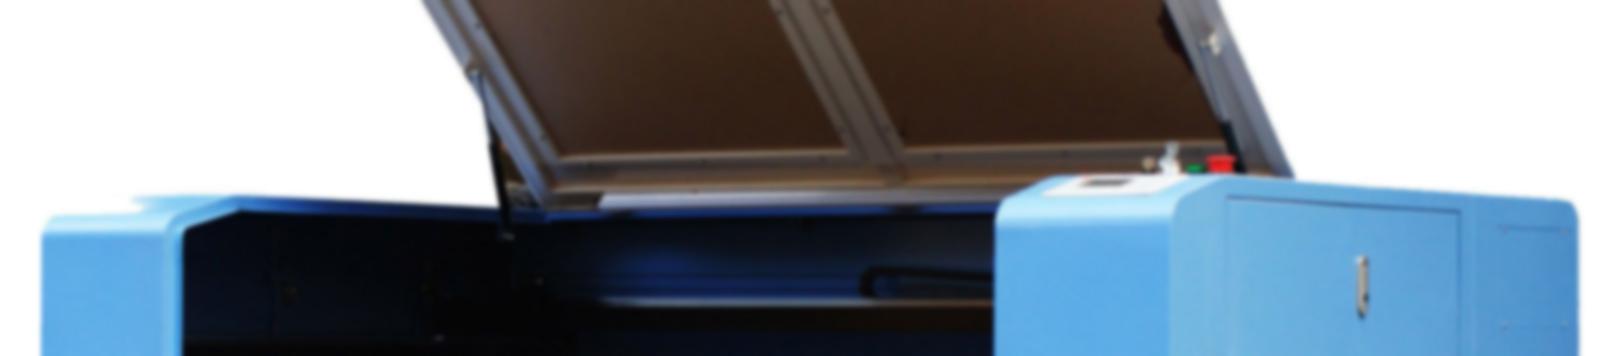 Large Lasercutter Fablab